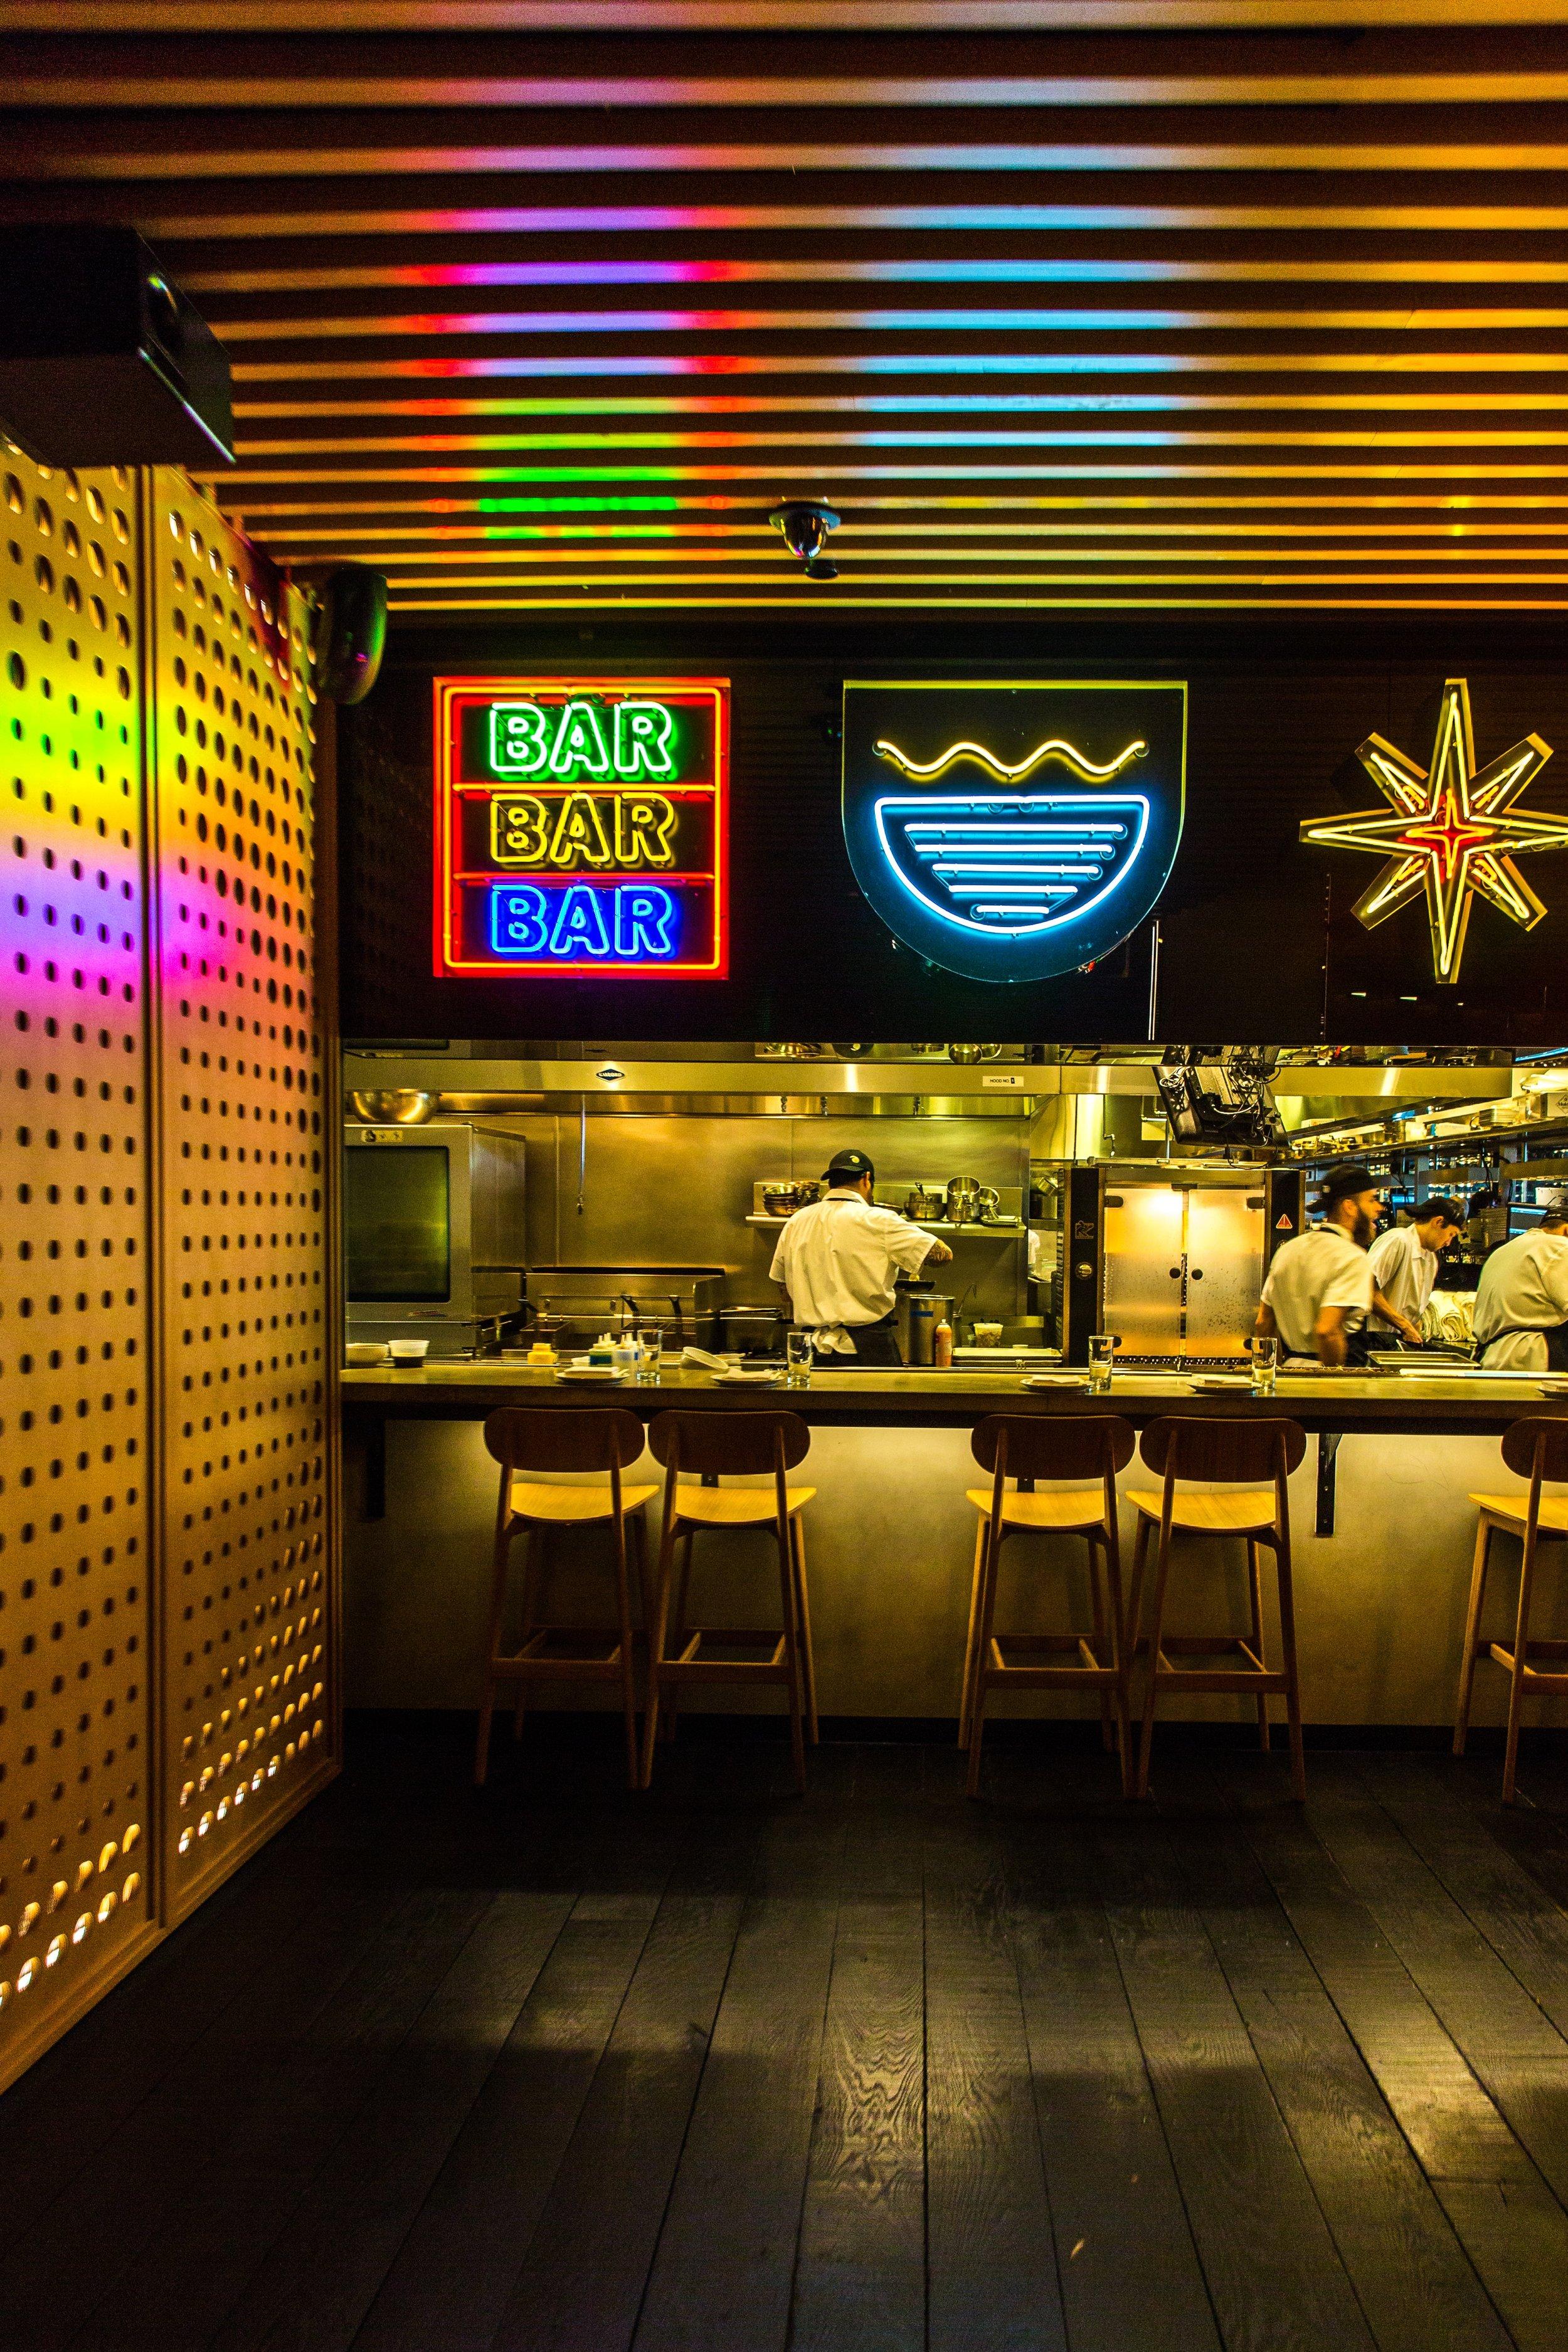 Neon Bar Sign Asian Restaurant